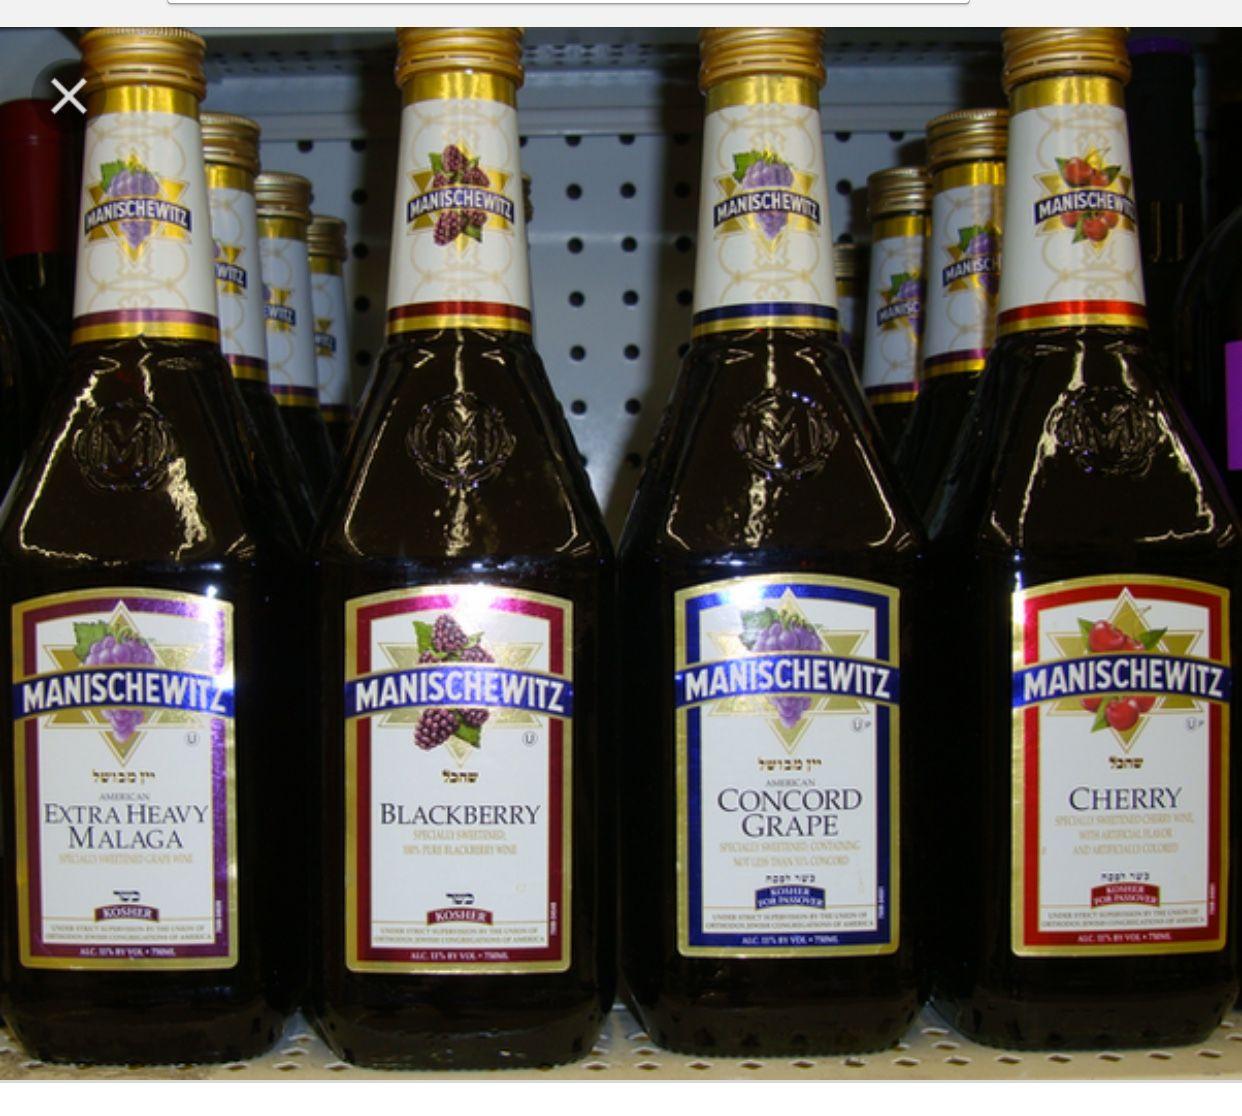 Pin By Lisa Law On Food Drinks Manischewitz Wine Wine Making Drinks